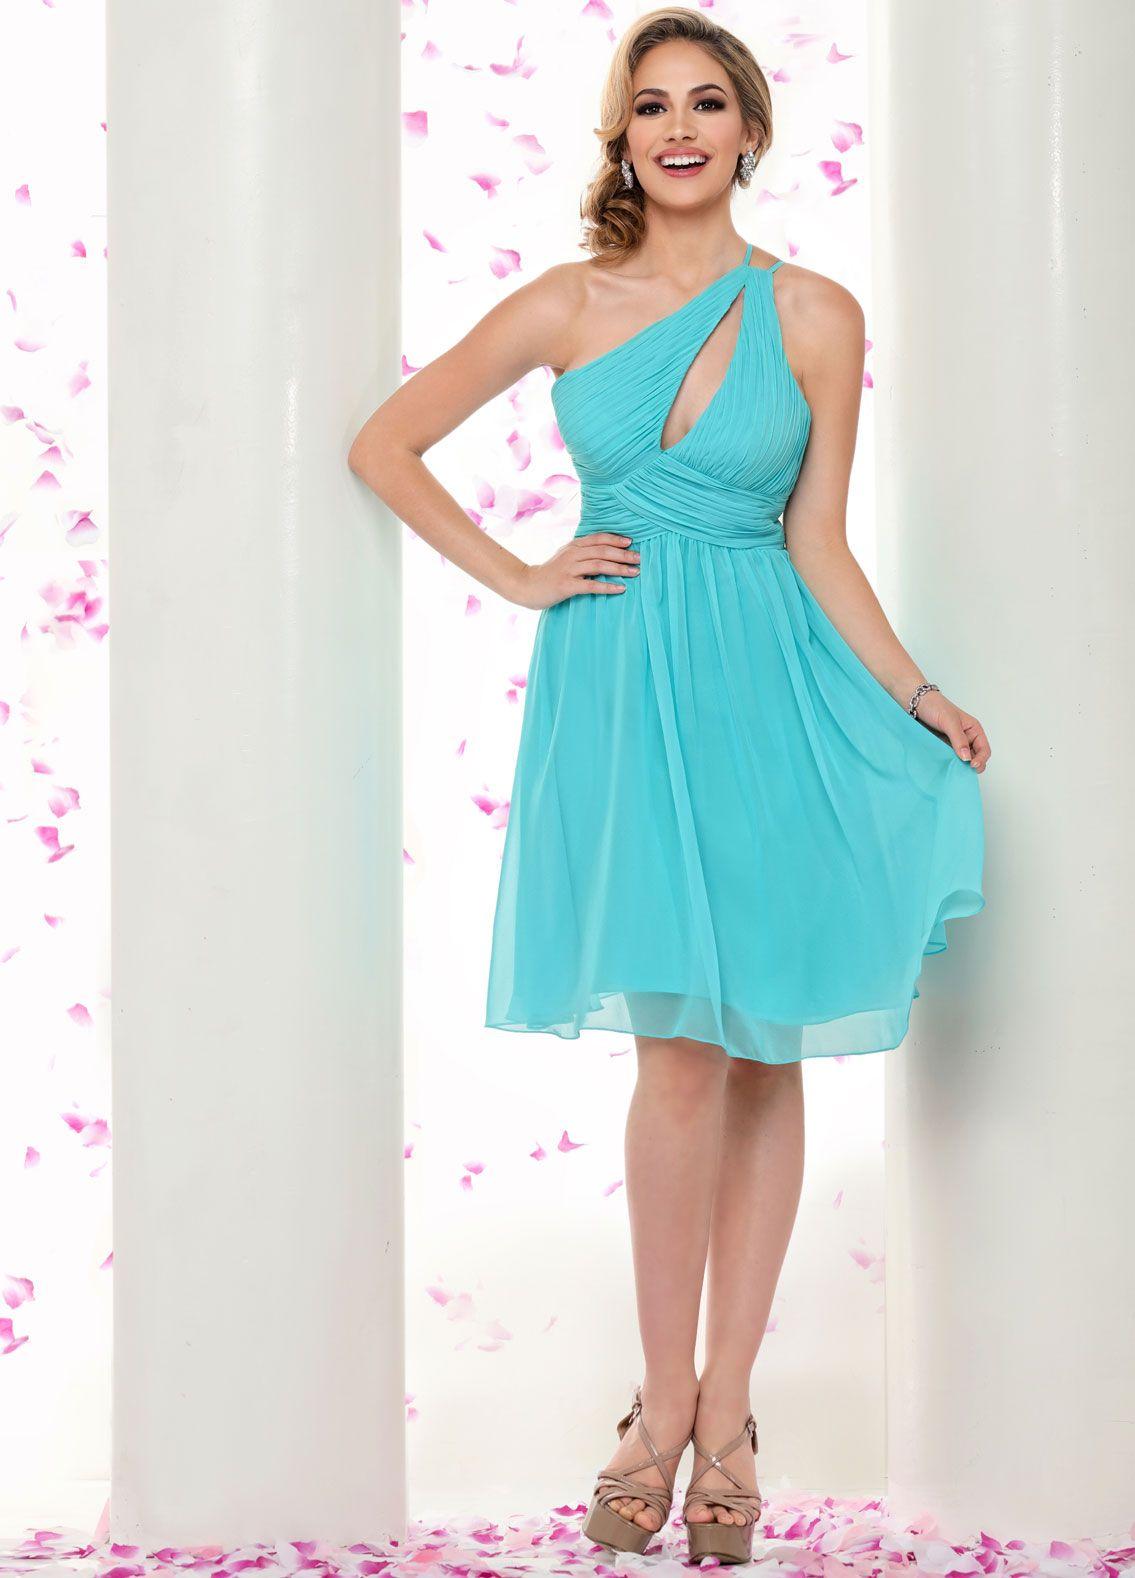 Bridesmaid Dresses Style #60264 | DaVinci Bridesmaids | Pinterest ...